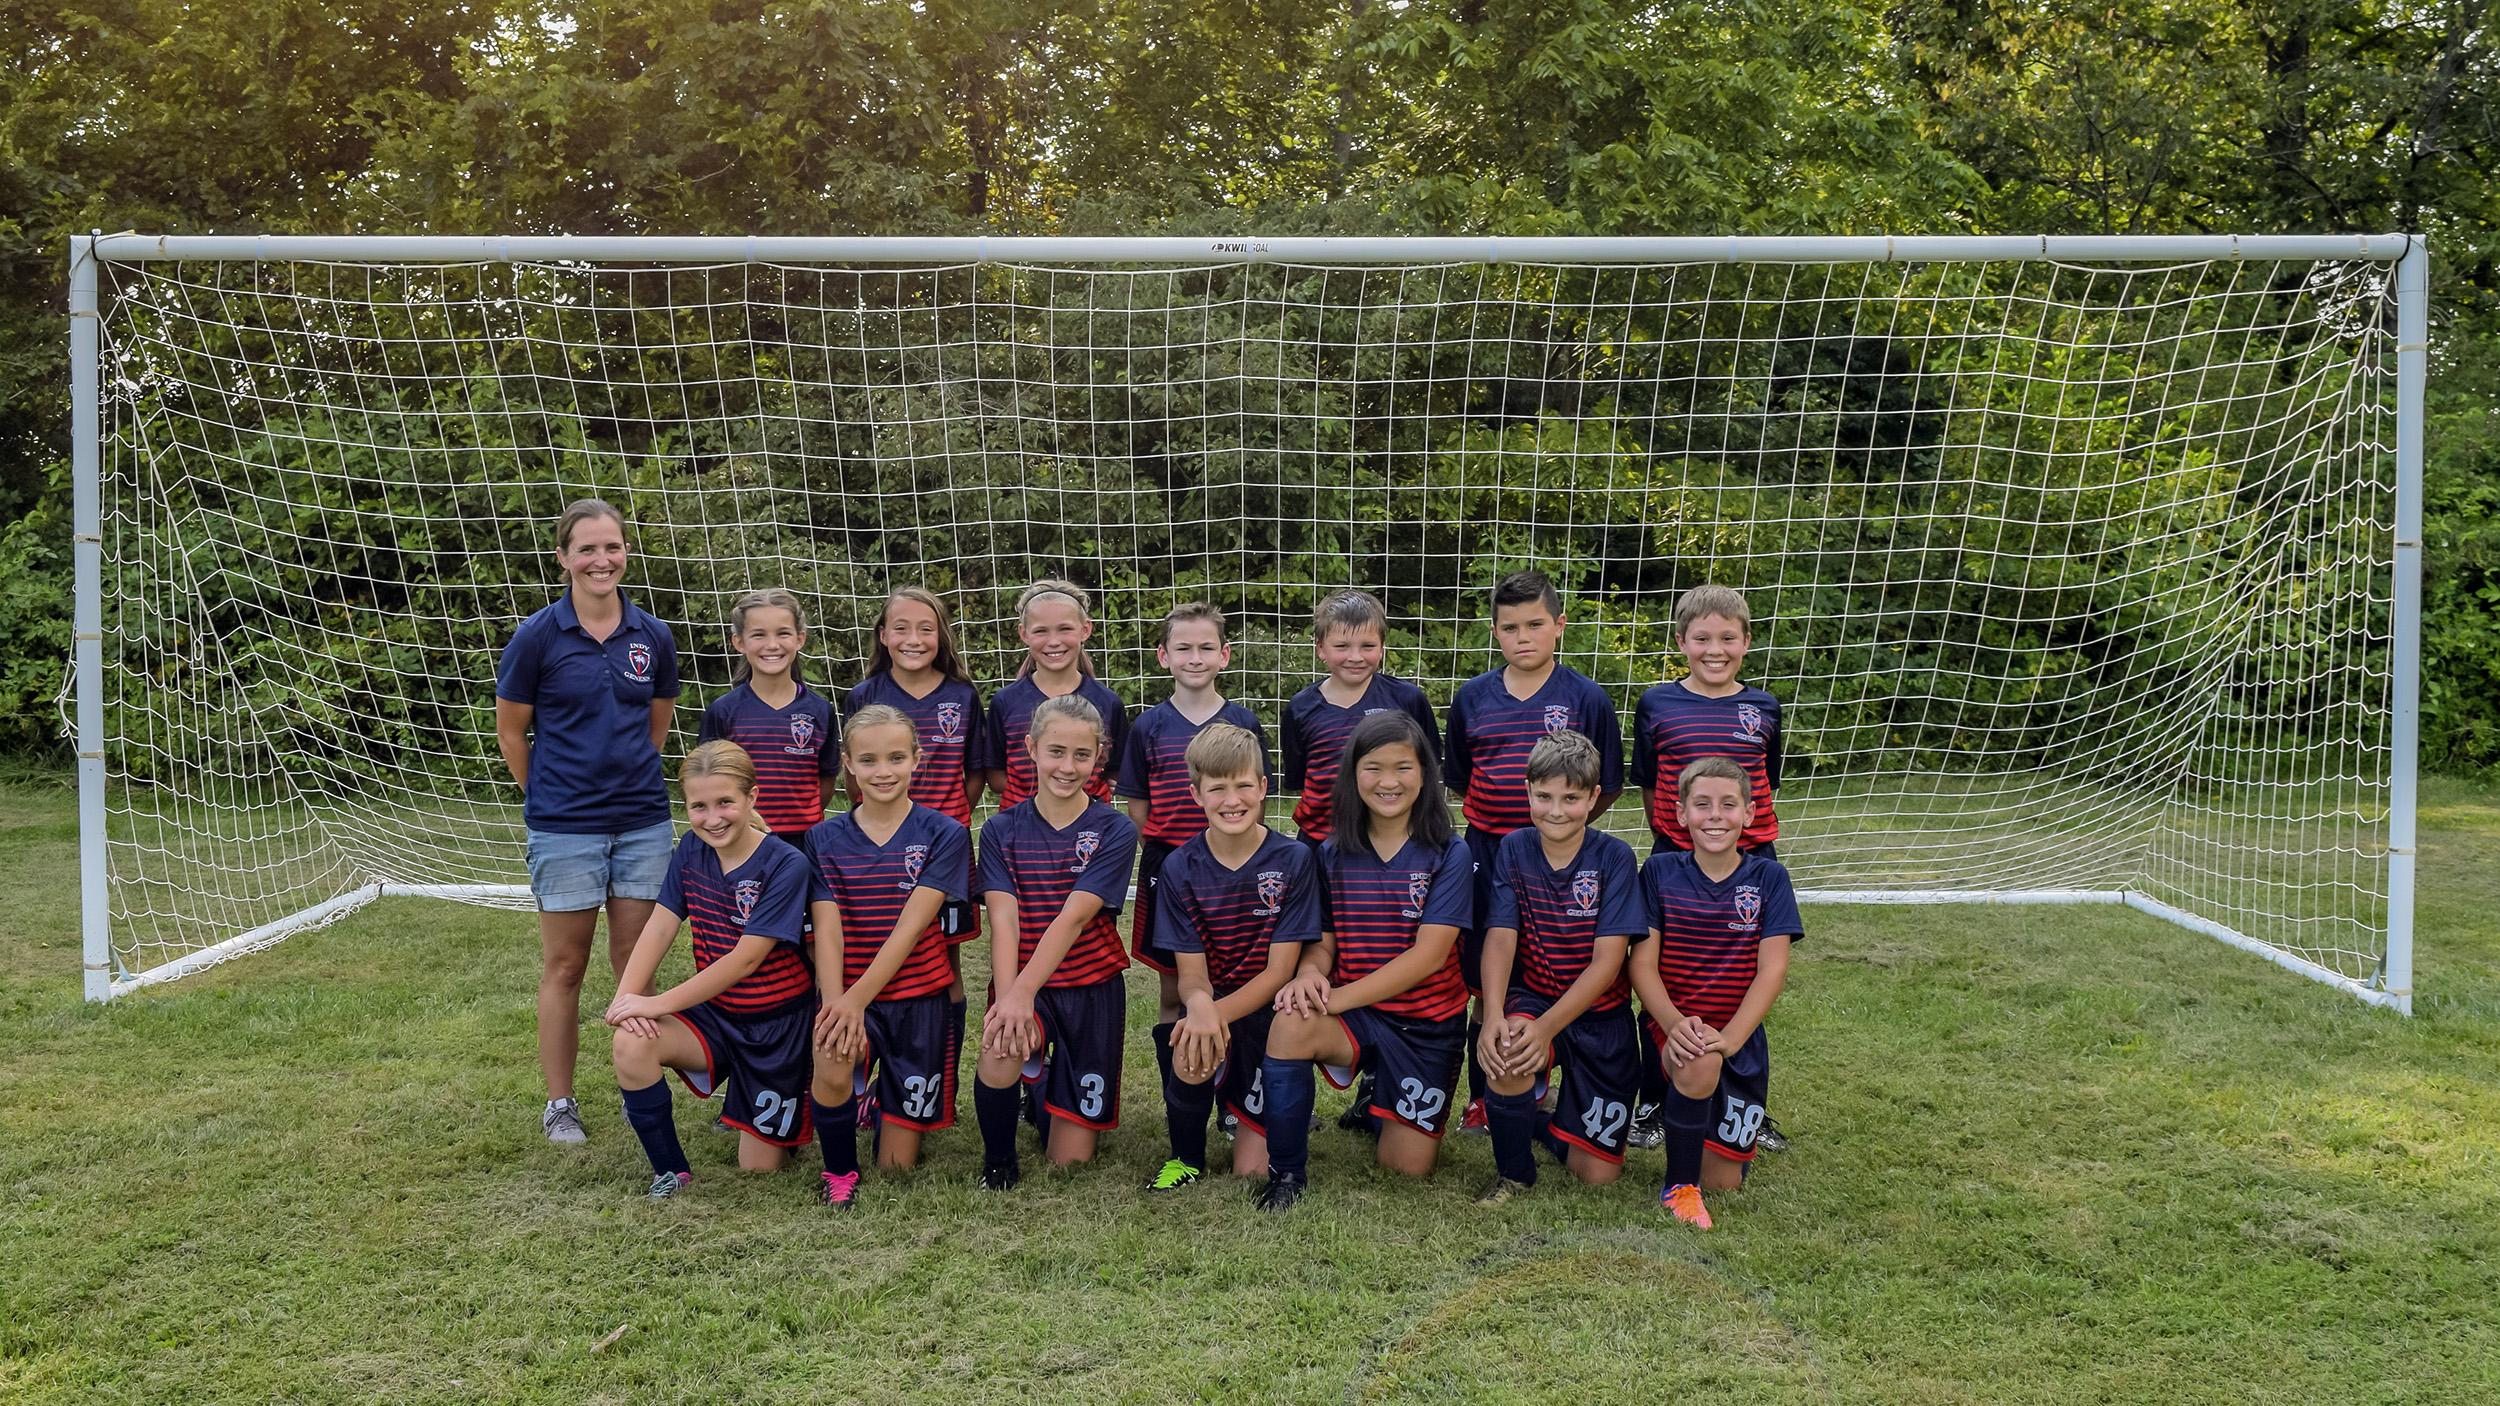 Indy Genesis Soccer U12 - Team 1 - 2020R